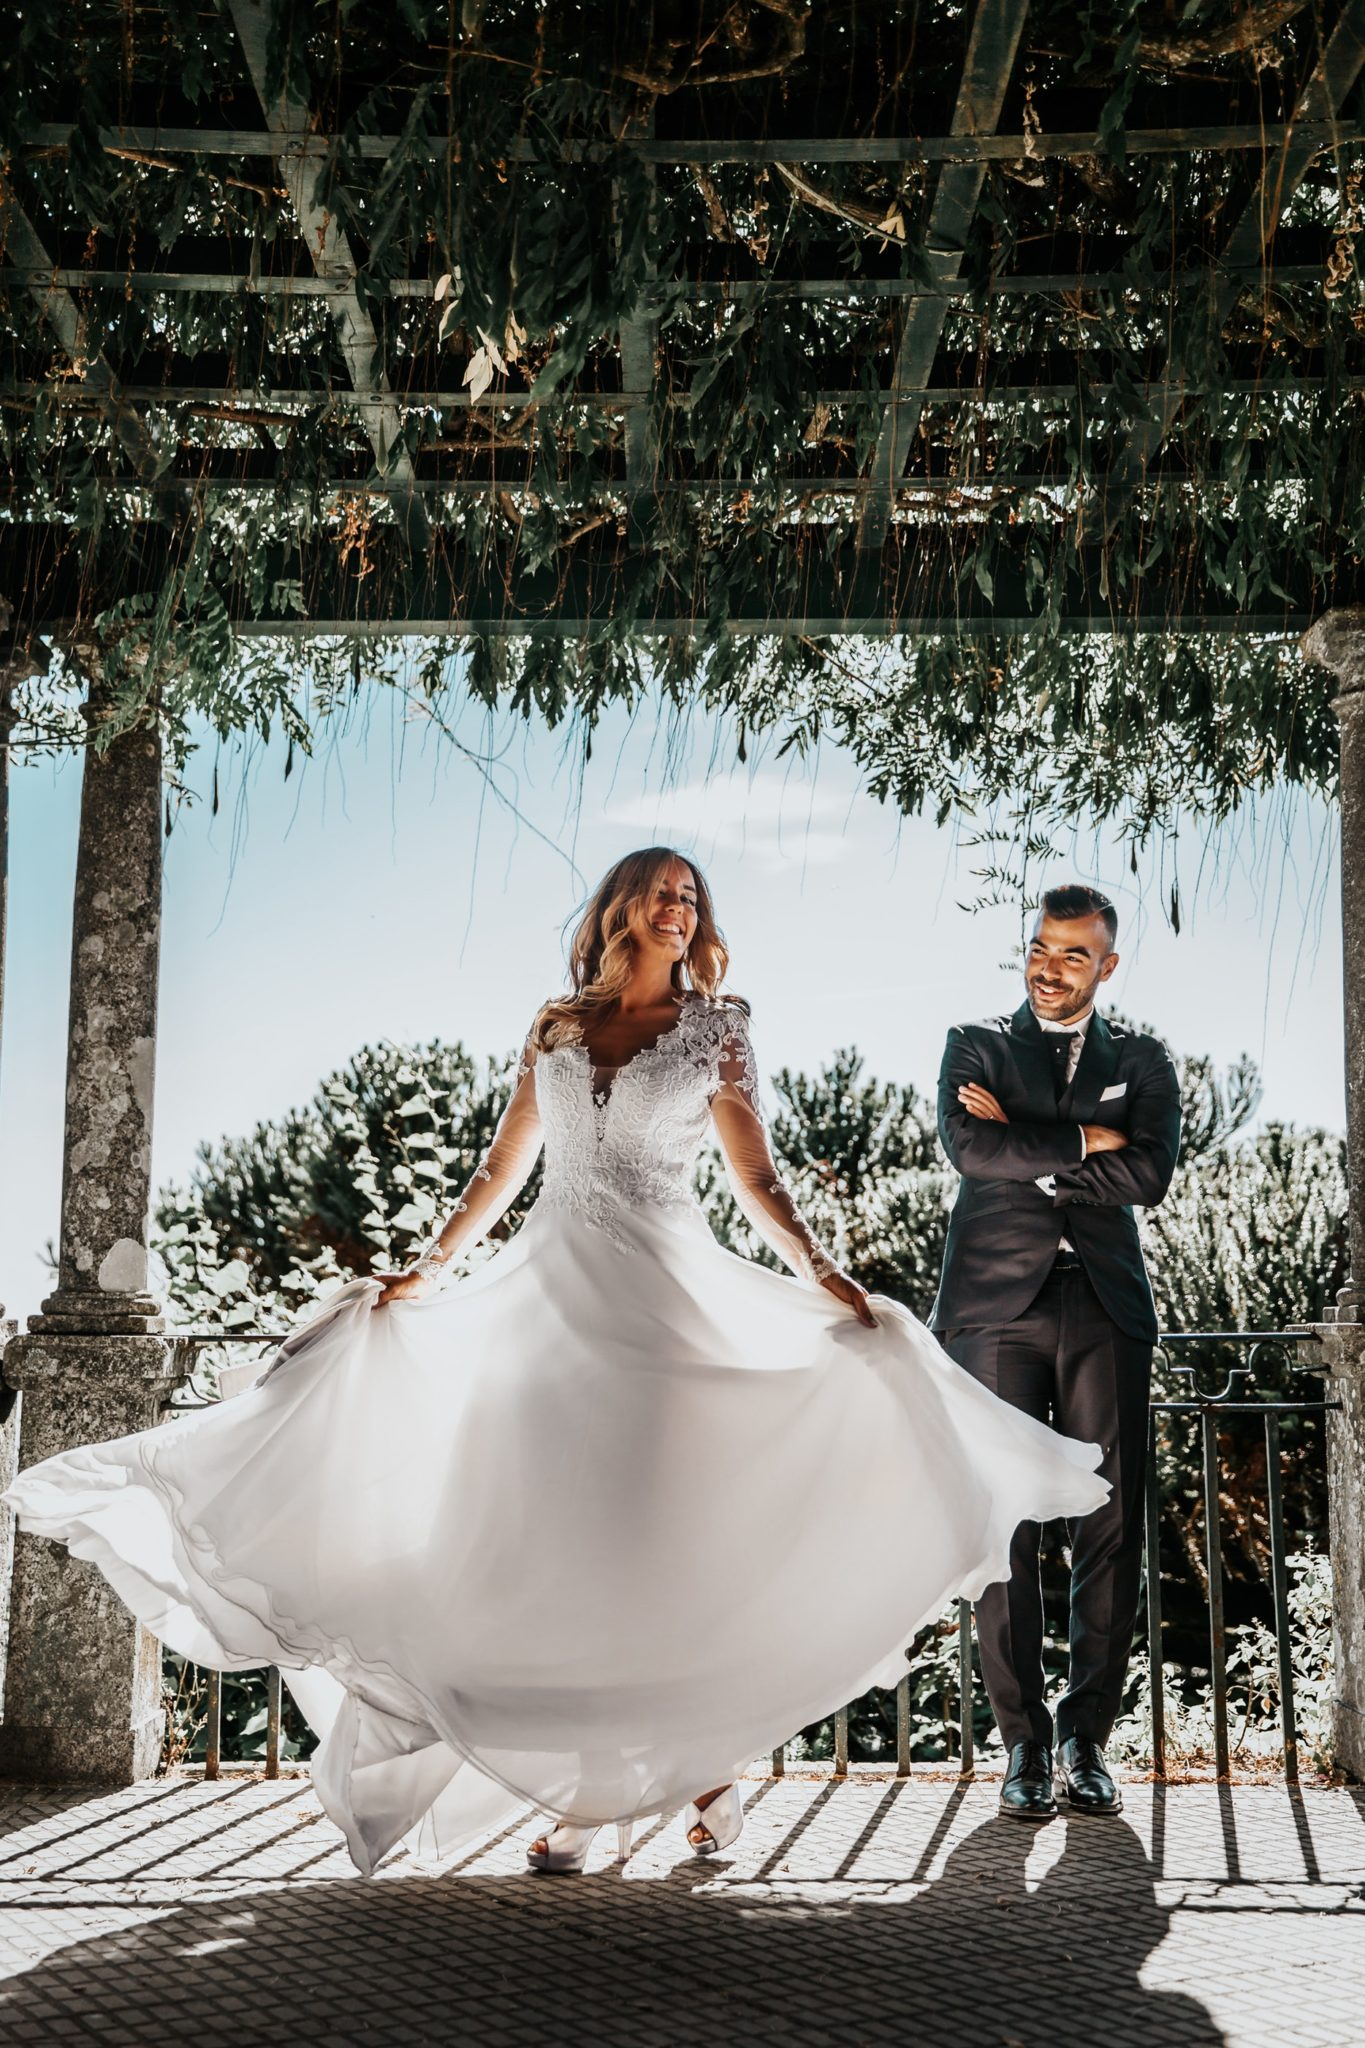 10 idei tematice pentru nunta ta in 2019